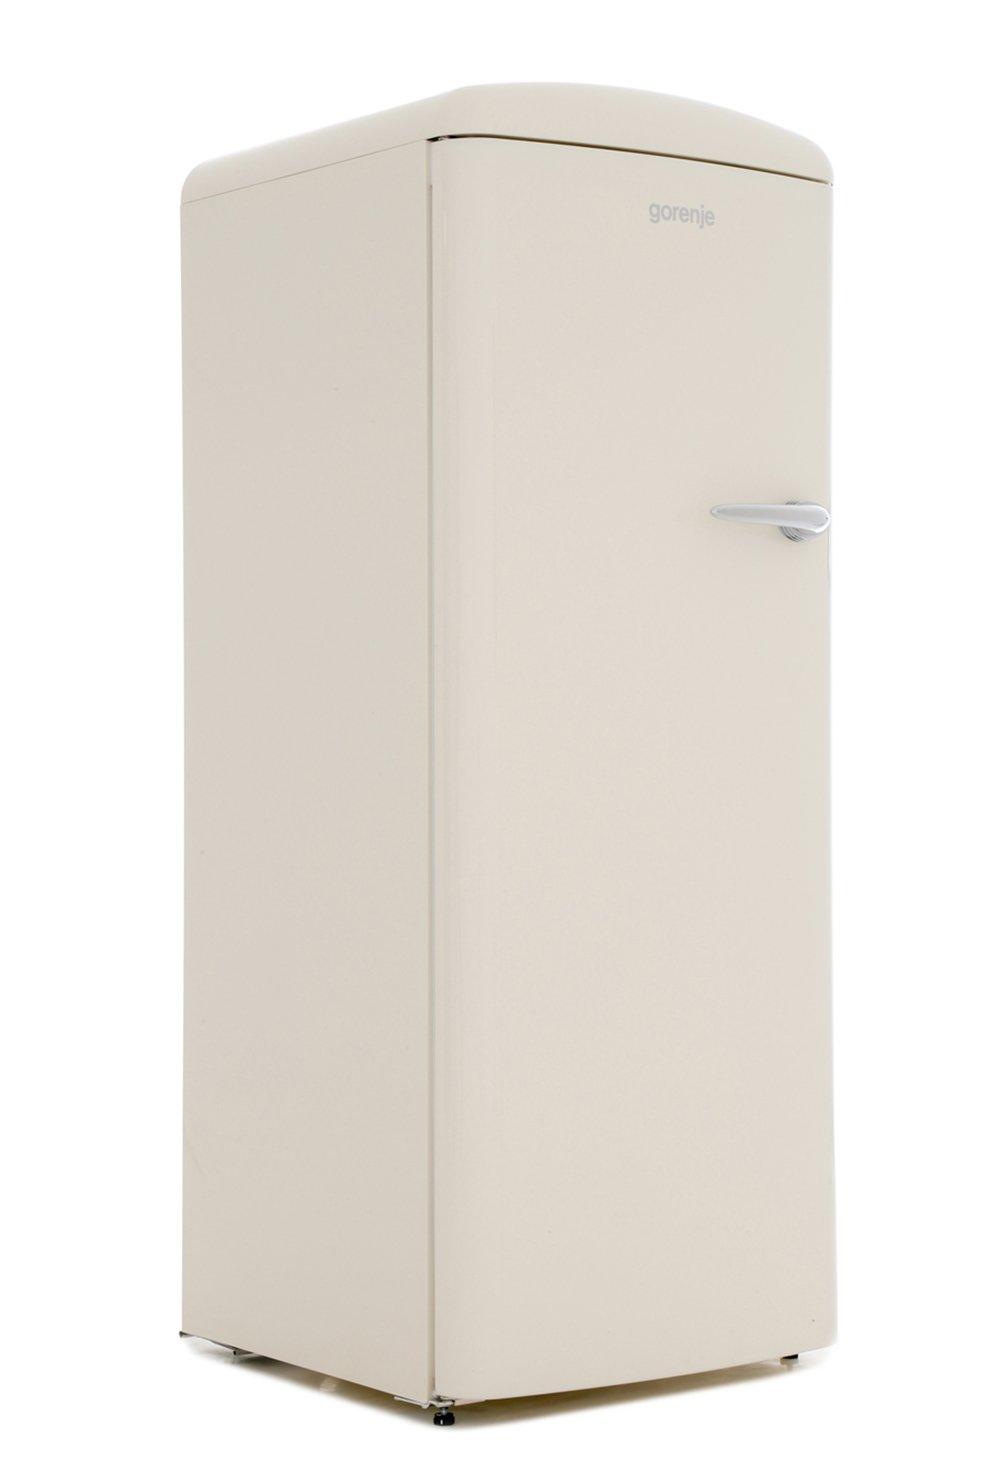 Gorenje ORB153CL Retro Tall Fridge with Ice Box